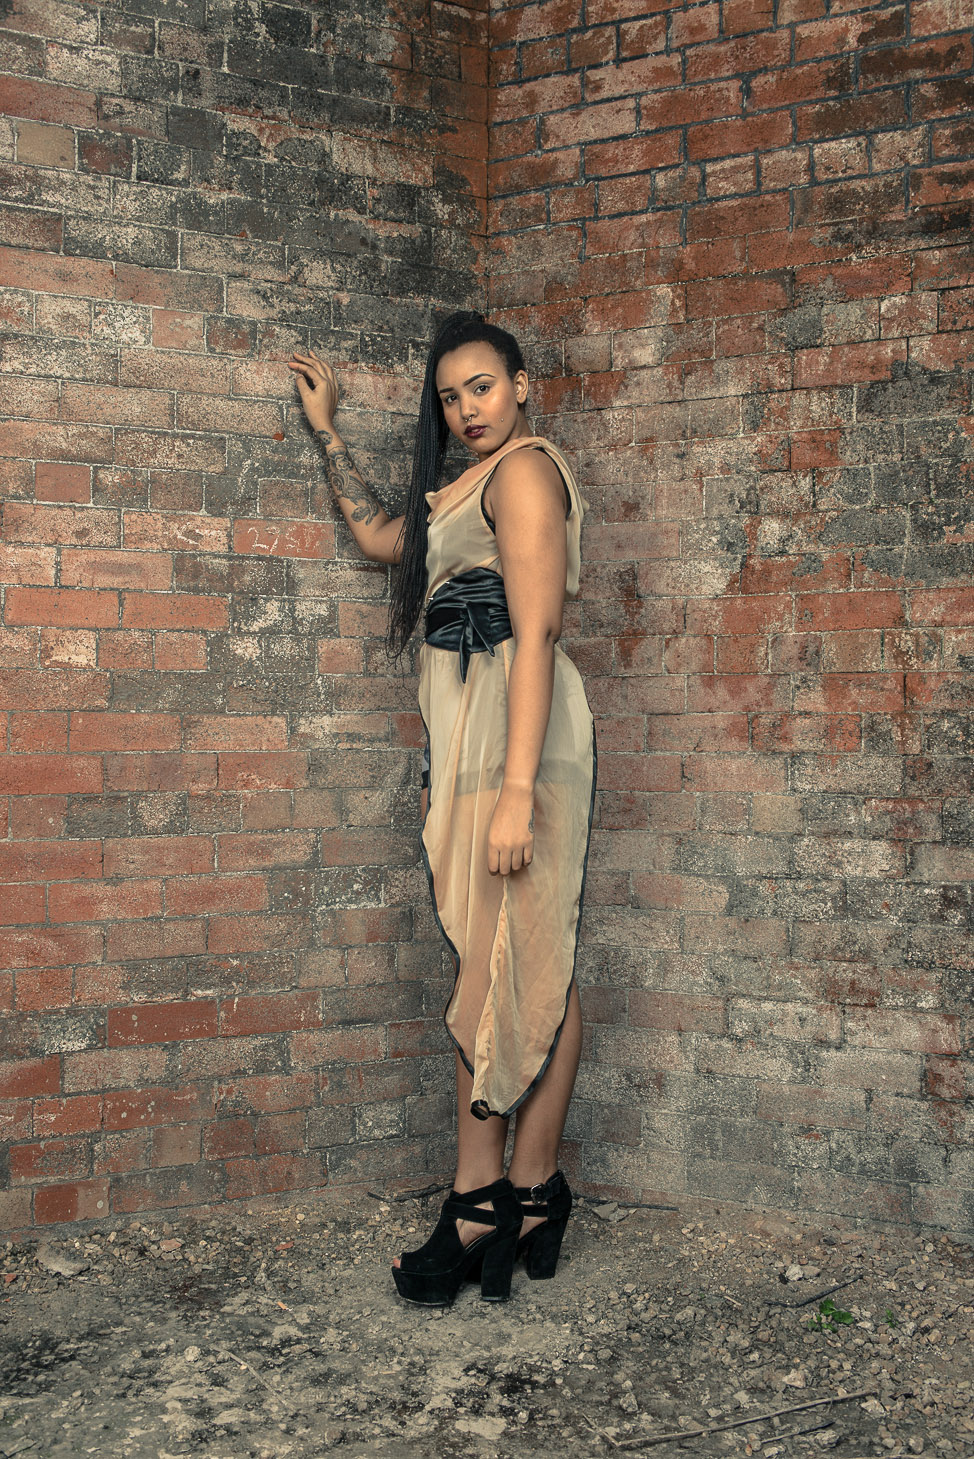 zaramia-ava-zaramiaava-leeds-fashion-designer-ethical-sustainable-tailored-minimalist-sheer-versatile-drape-top-gold-binding-belt-wrap-cowl-styling-womenswear-models-photoshoot-location-1